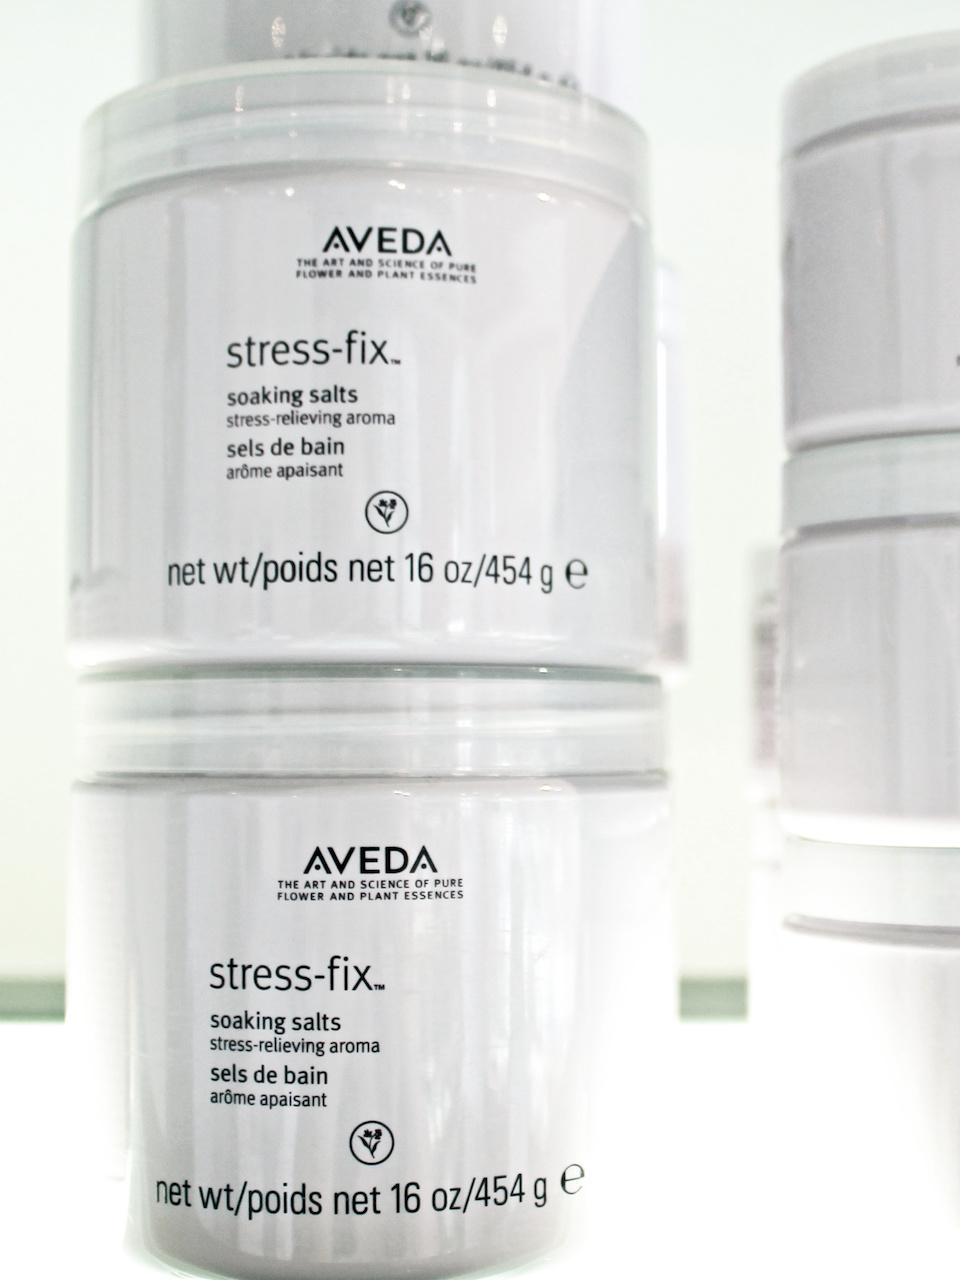 Aveda's Stress-Fix soaking salts, $42, at Tonya Jones SalonSpa